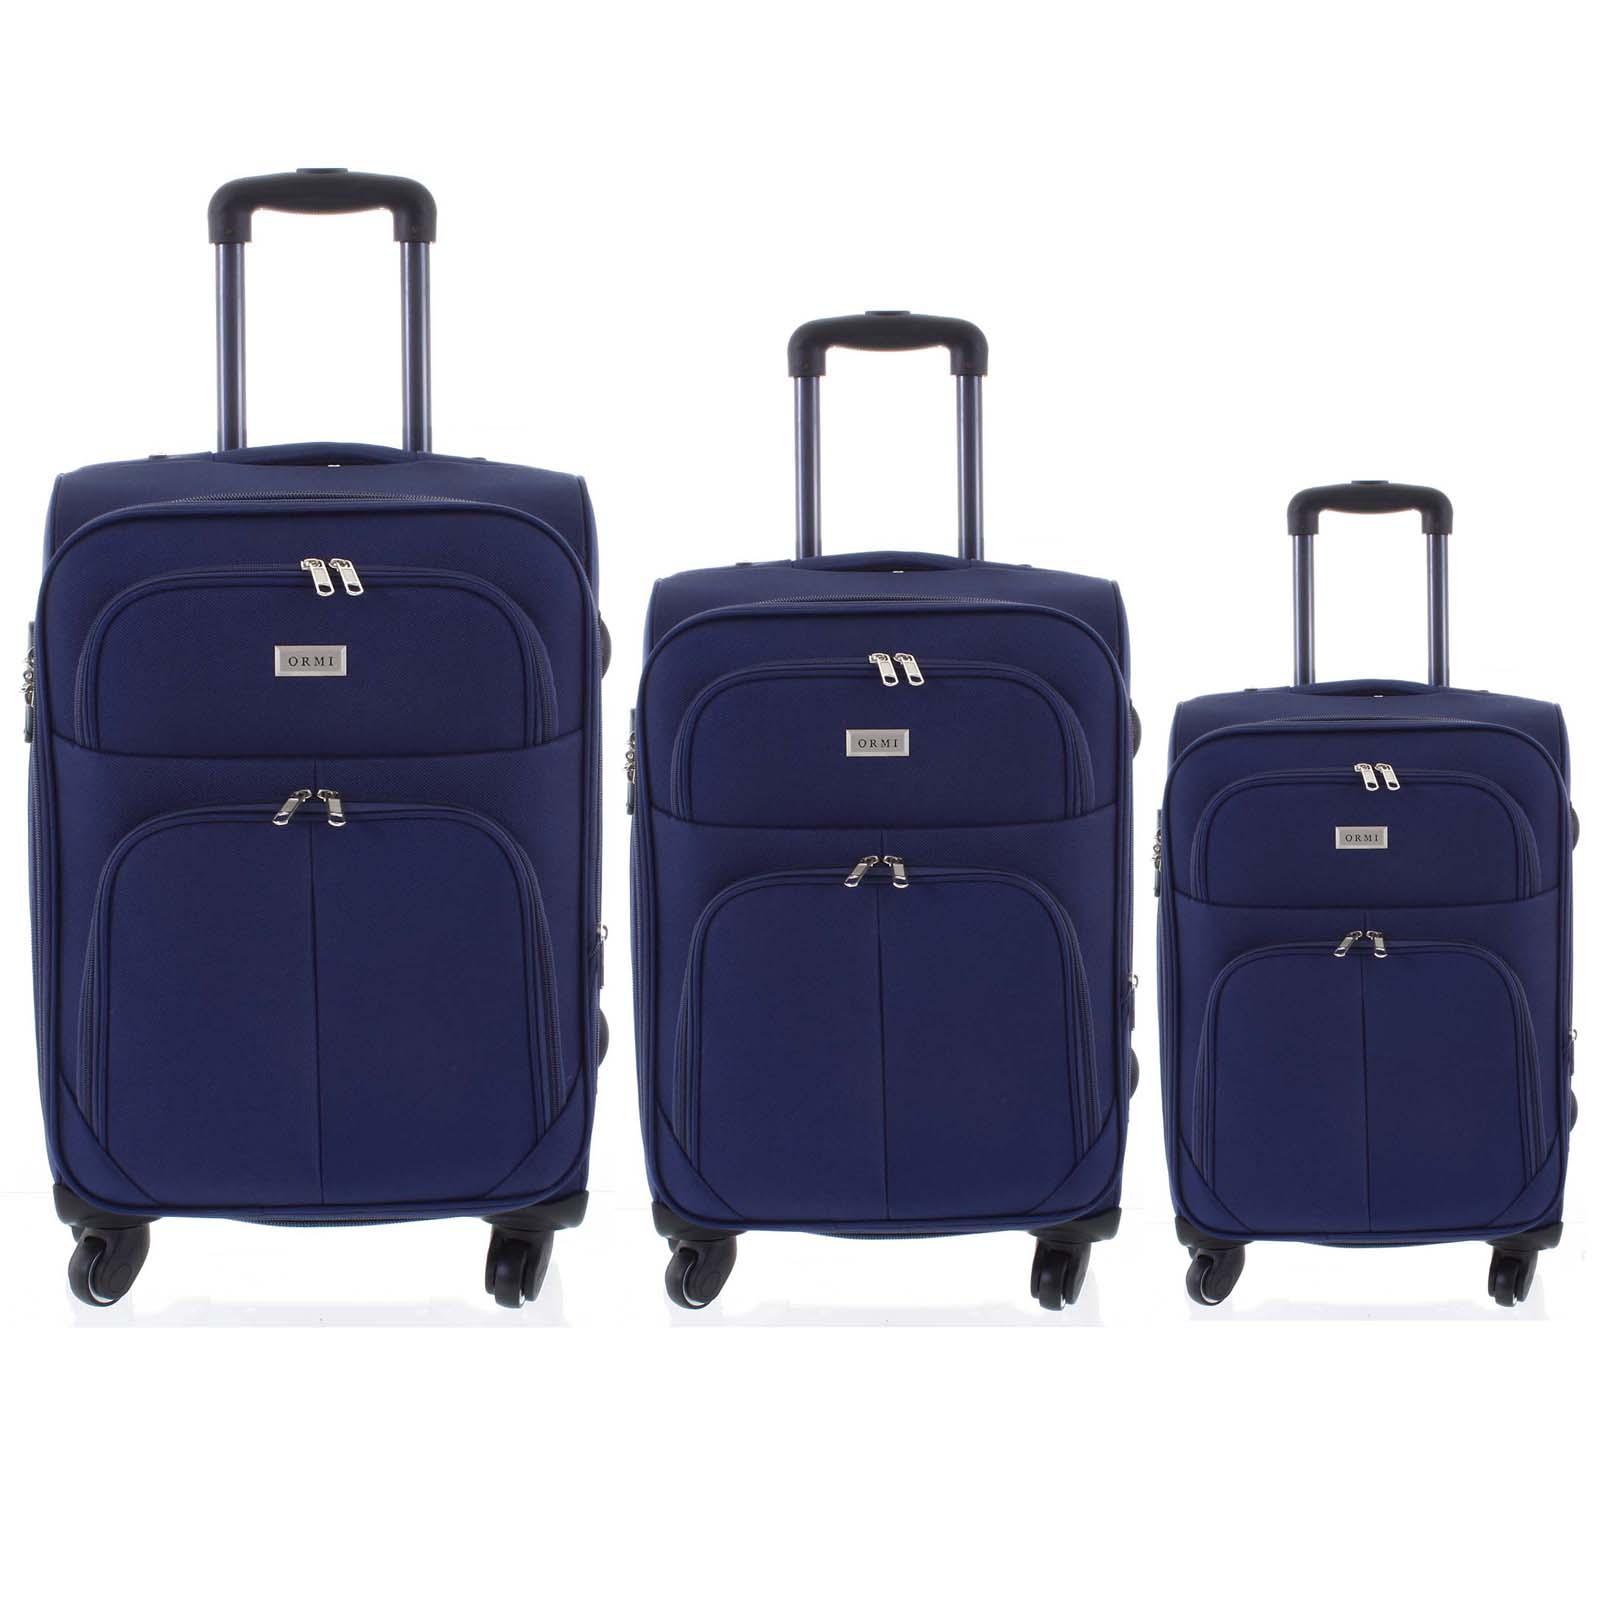 Cestovní kufr modrý sada - Ormi Tessa S, M, L